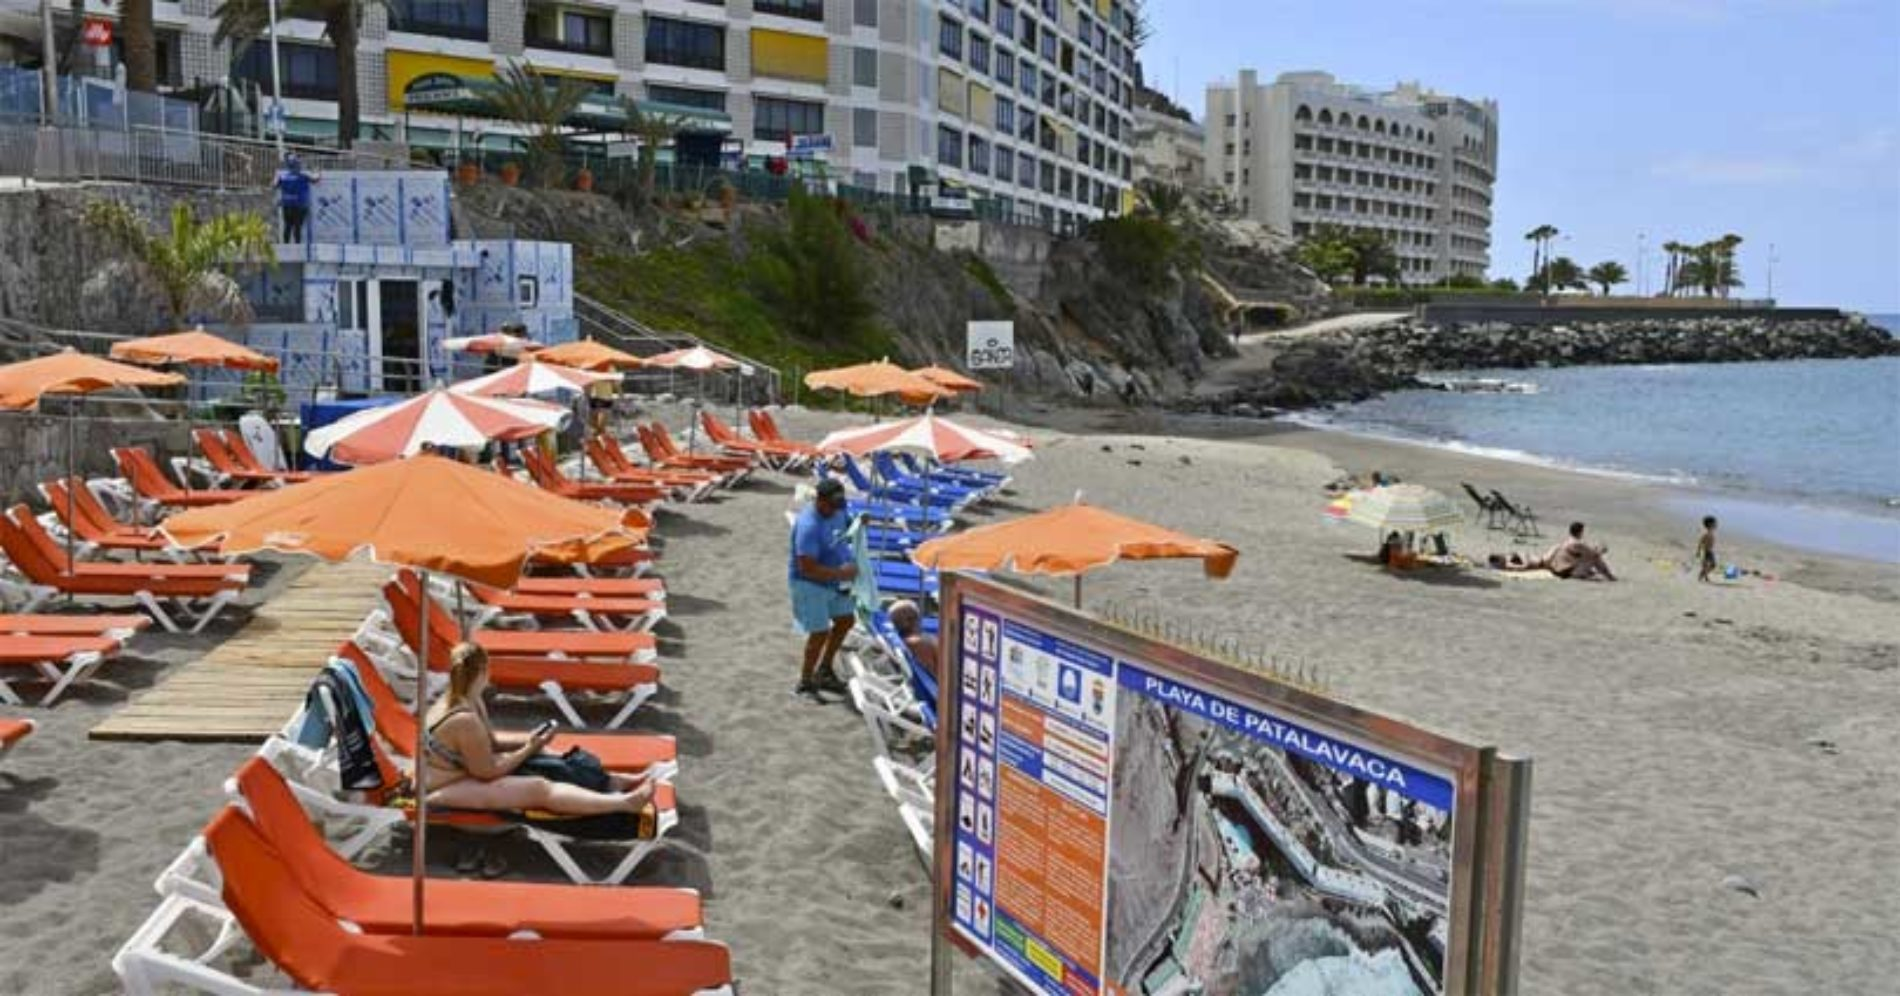 Patalavaca-stranda oppgraderes